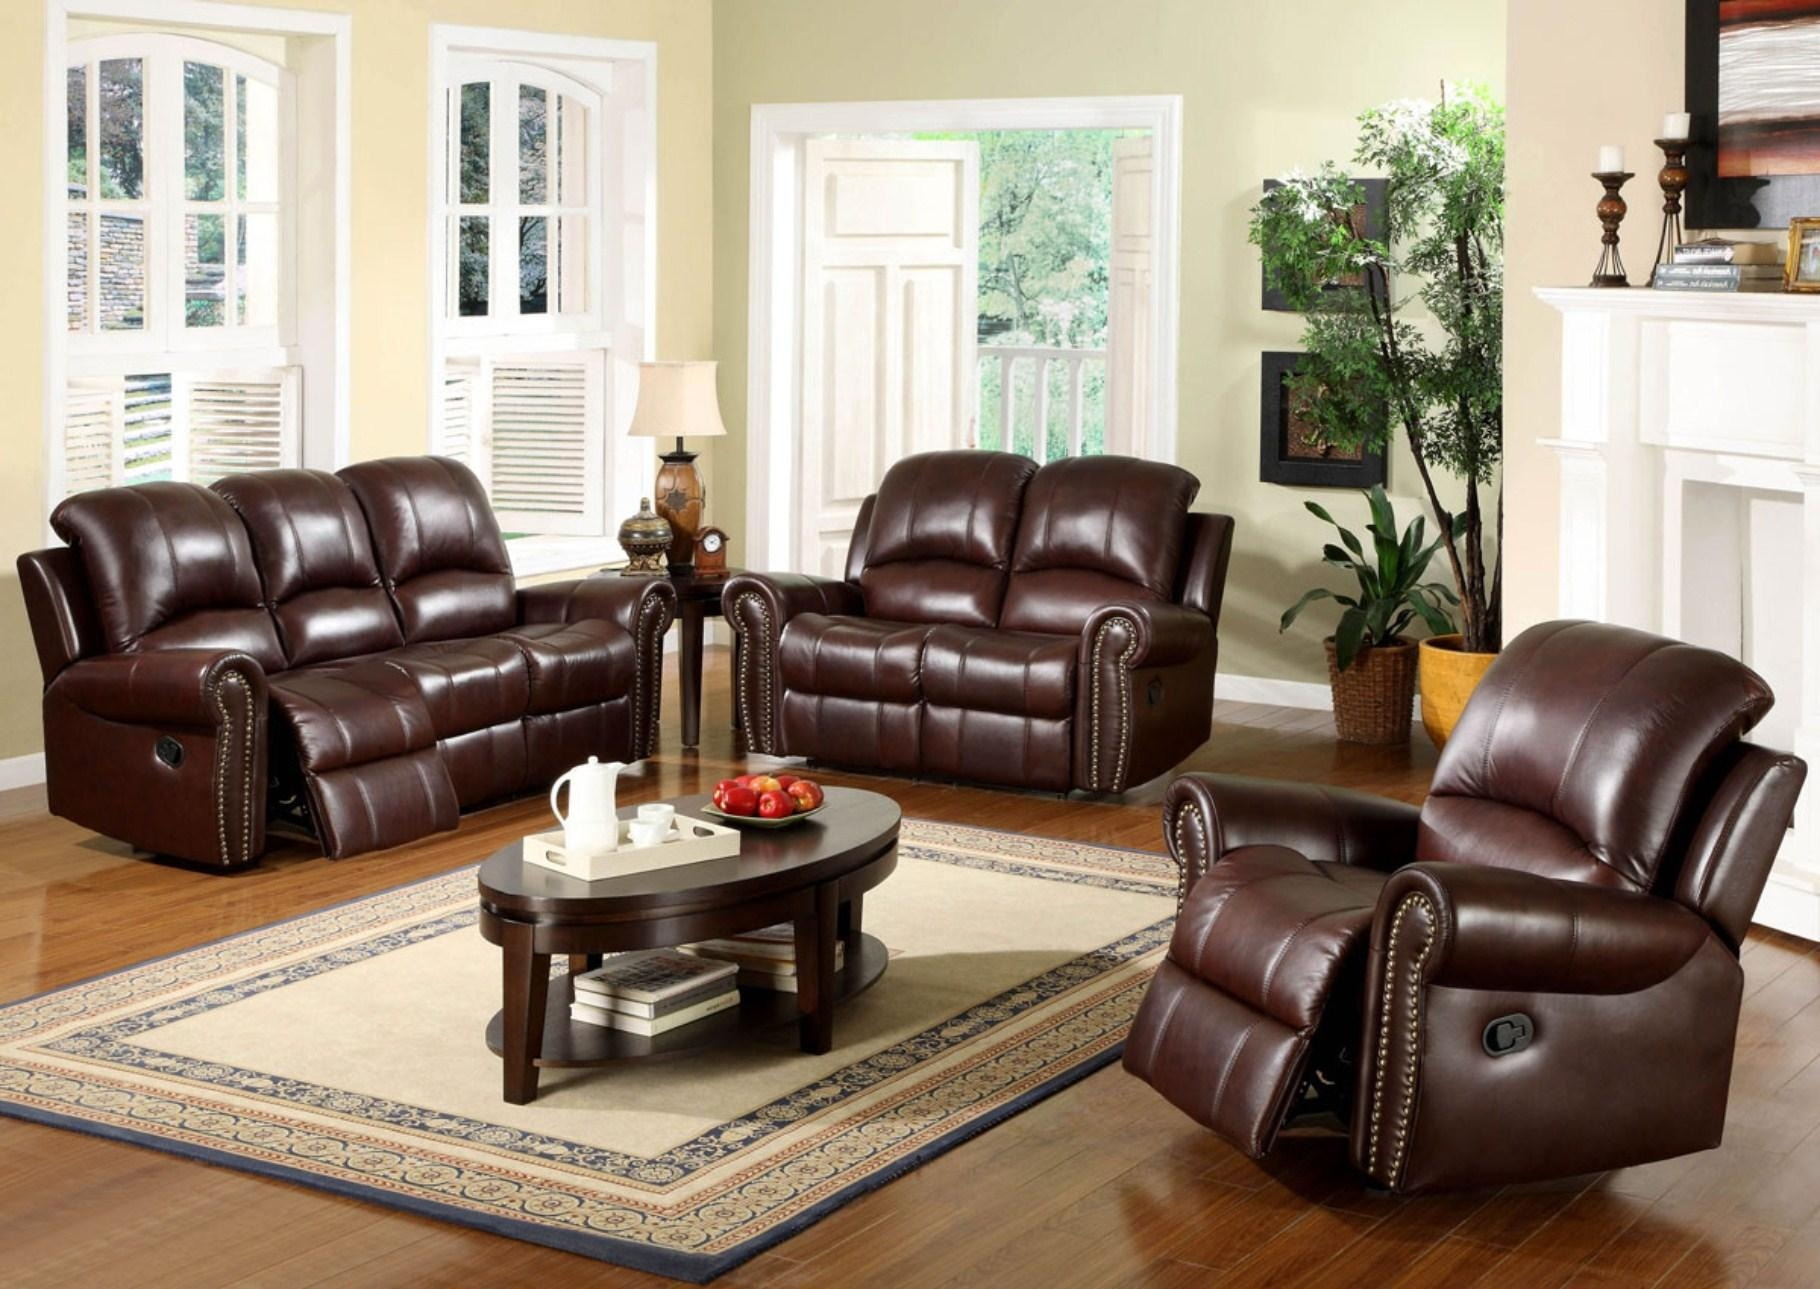 Sofas Center : Full Grain Leather Sofa Sale Power Reclining Costco In Full Grain Leather Sofas (View 9 of 20)